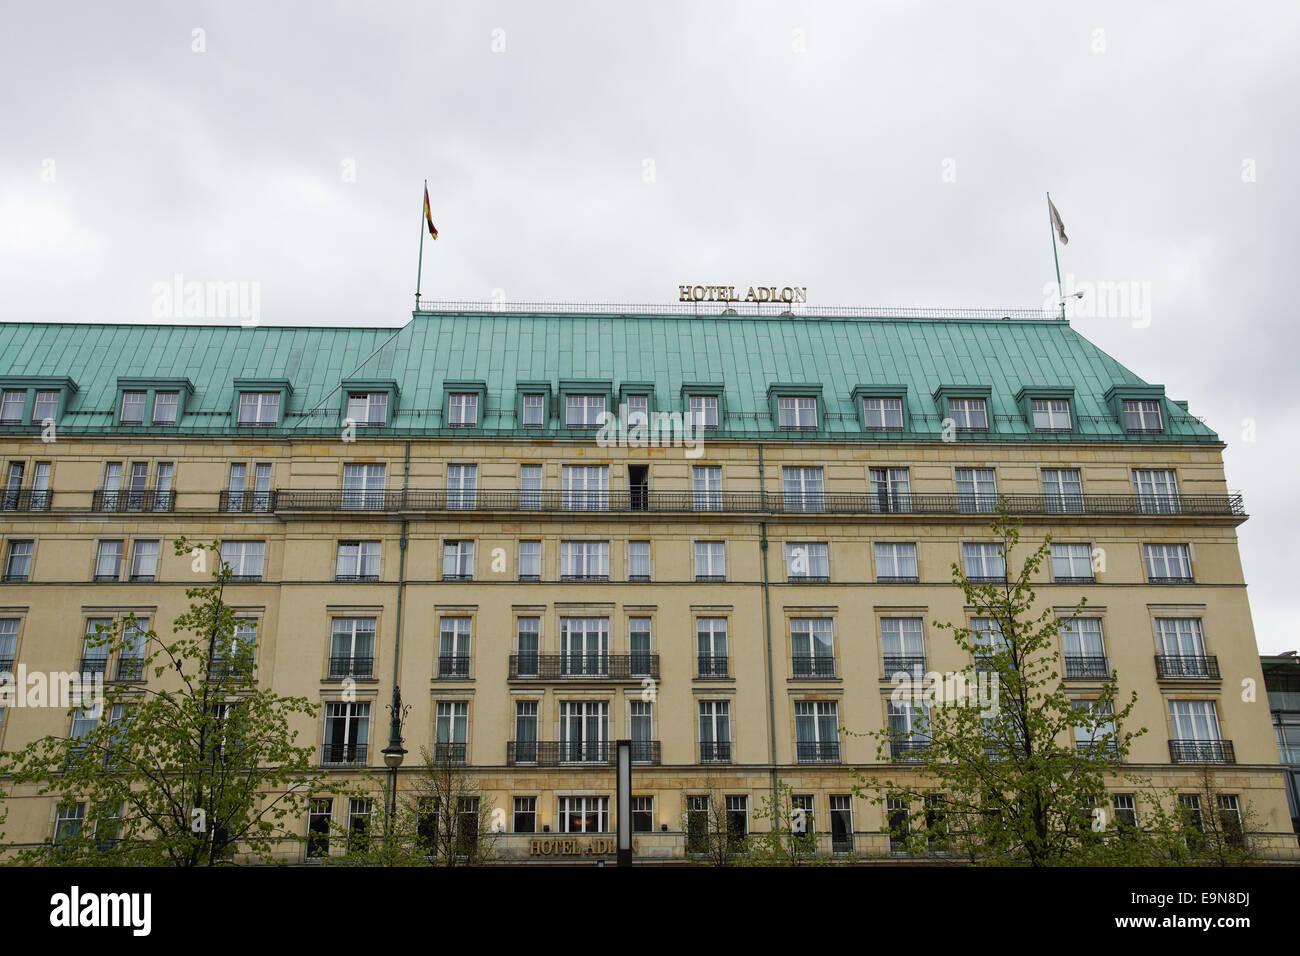 Hotel Adlon Kempinski in Berlin, Deutschland - Stock Image